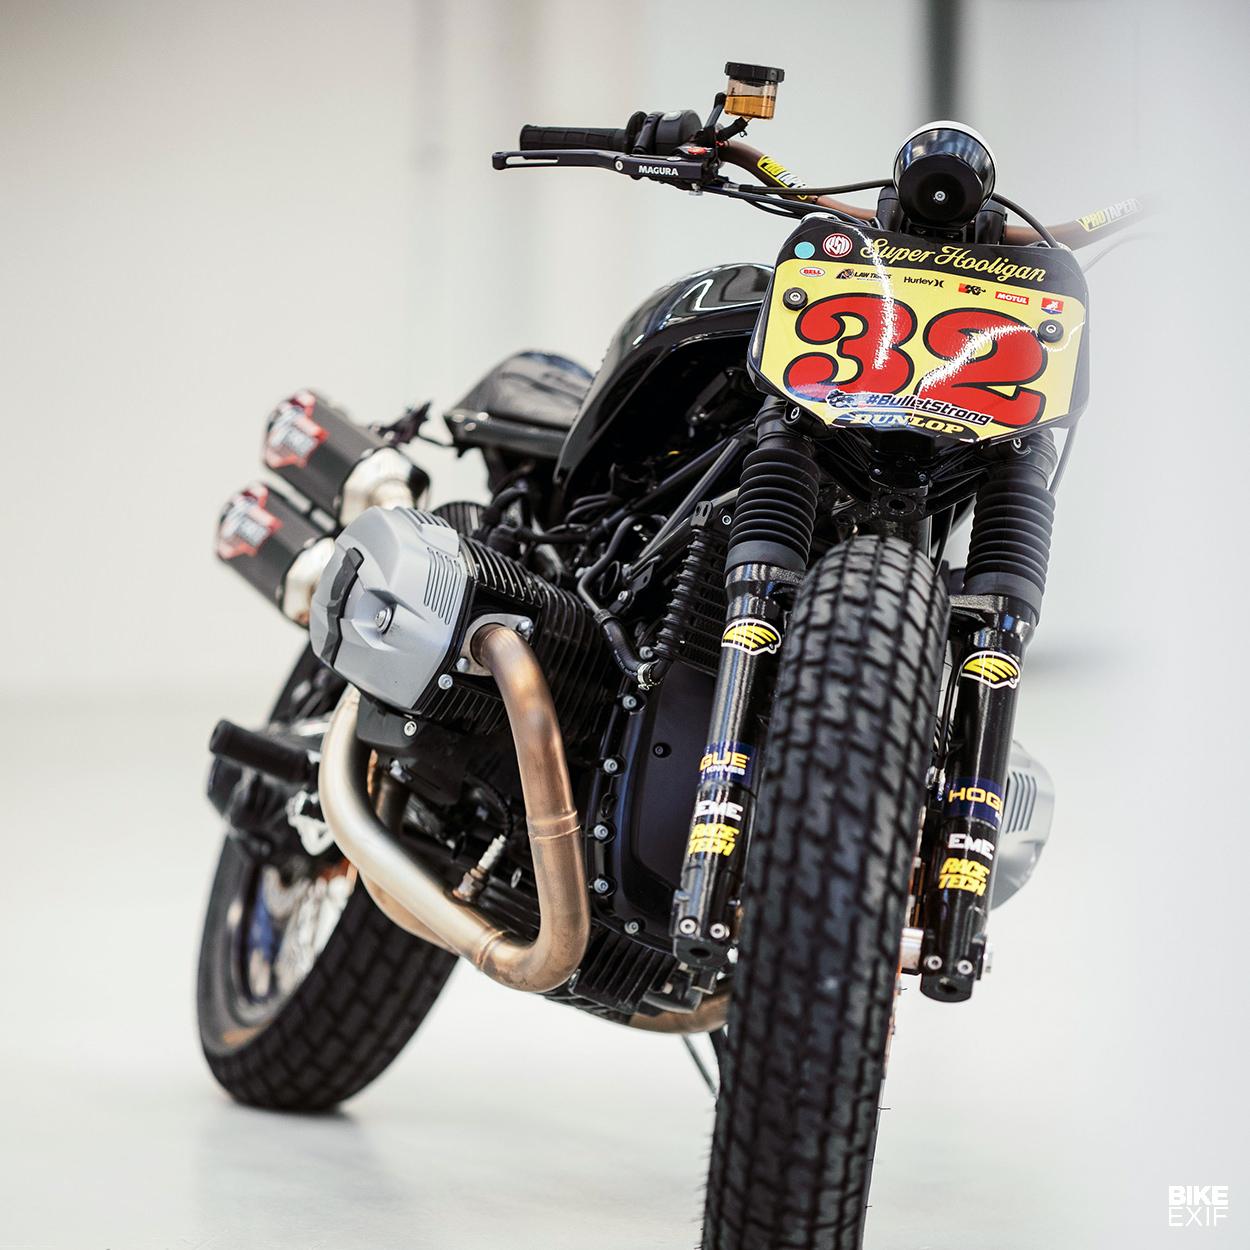 bmw-flat-track-motorcycle-4.jpg